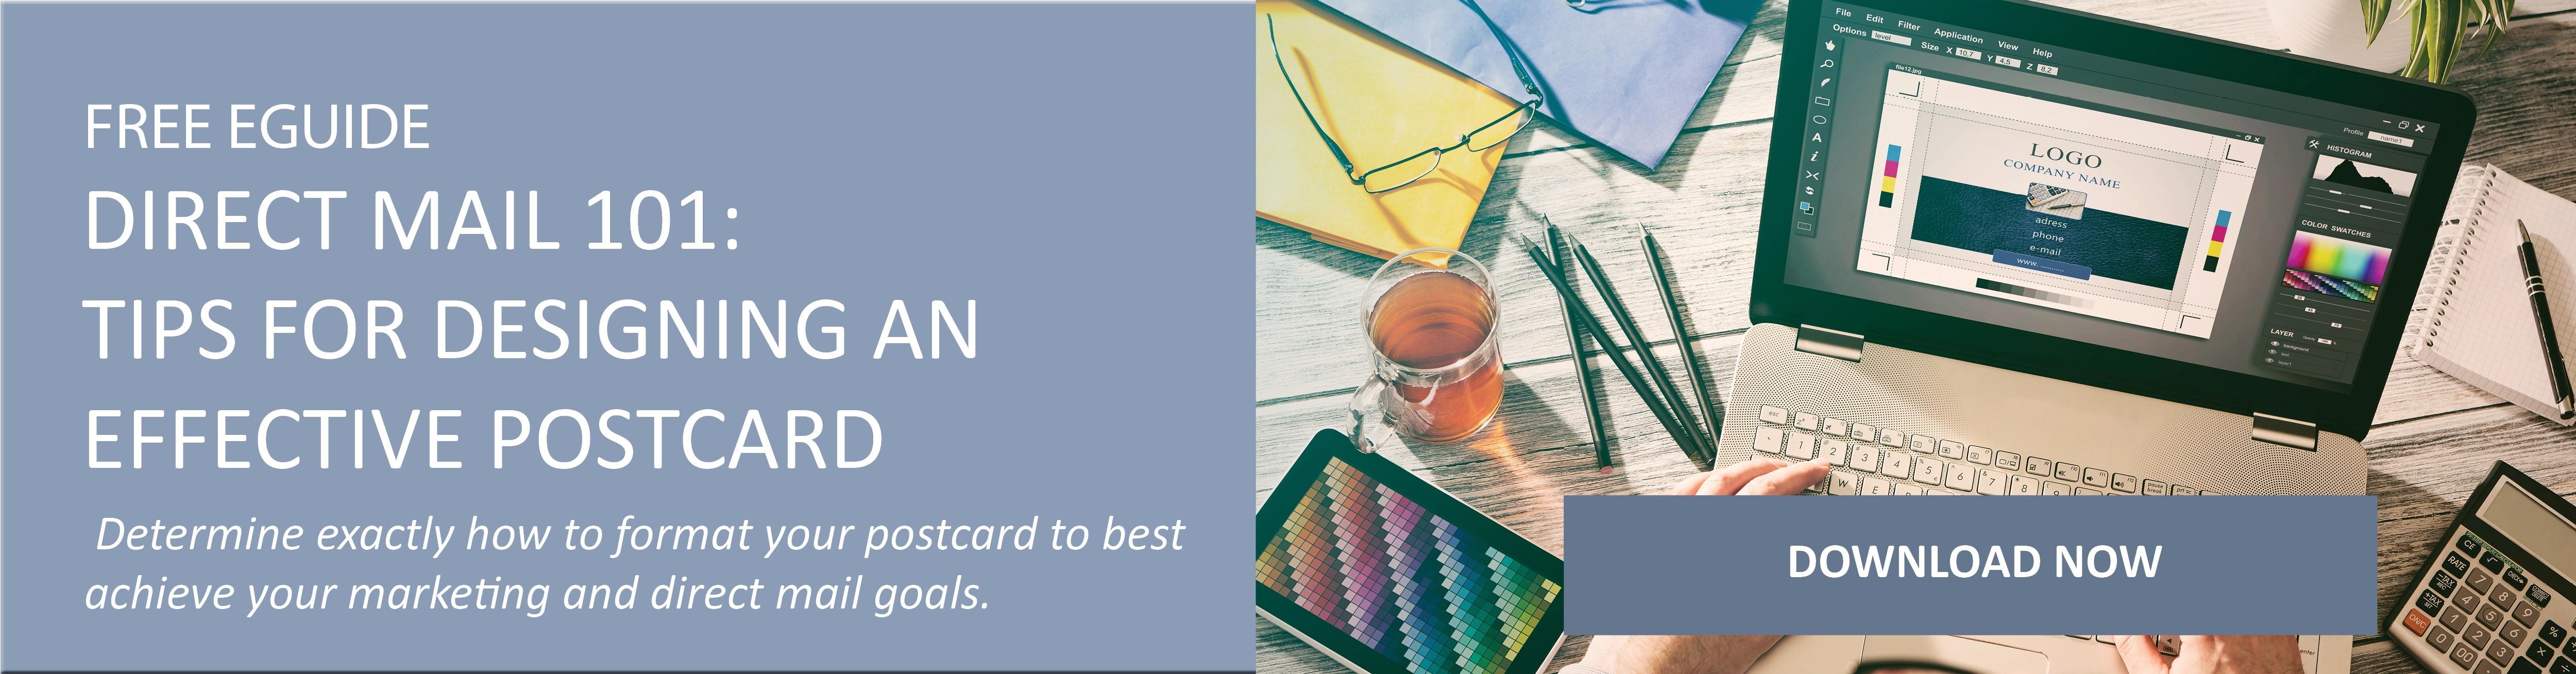 CTA-dm-101-postcard-design